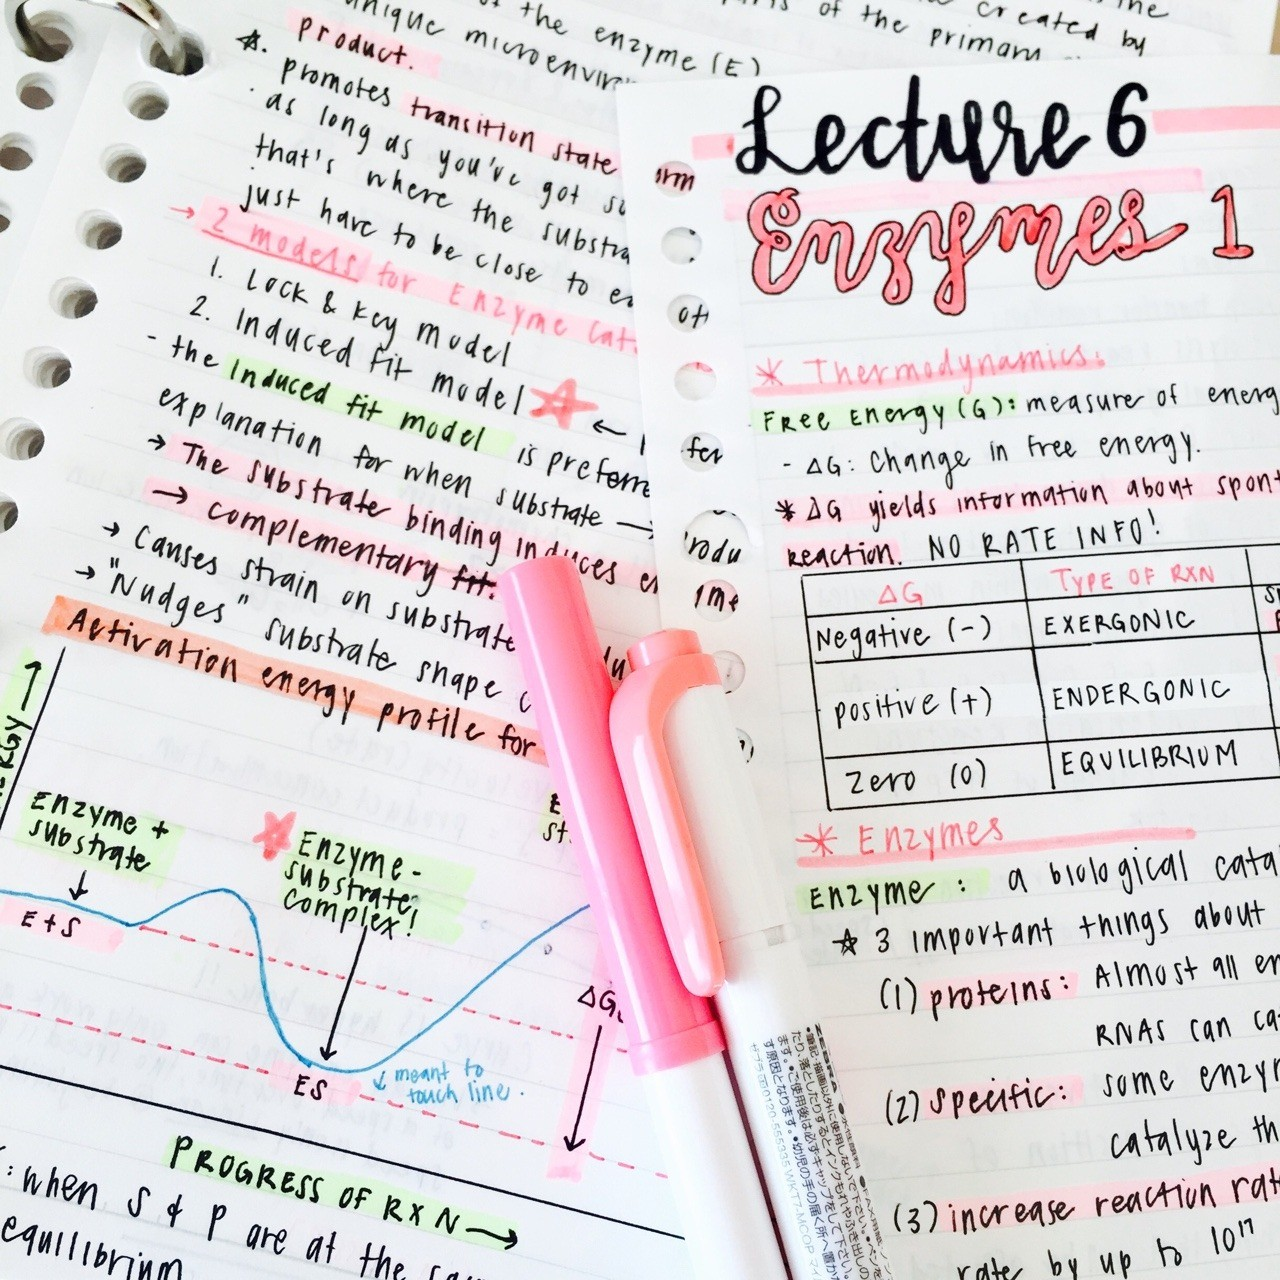 Important Biochemistry Revision Points